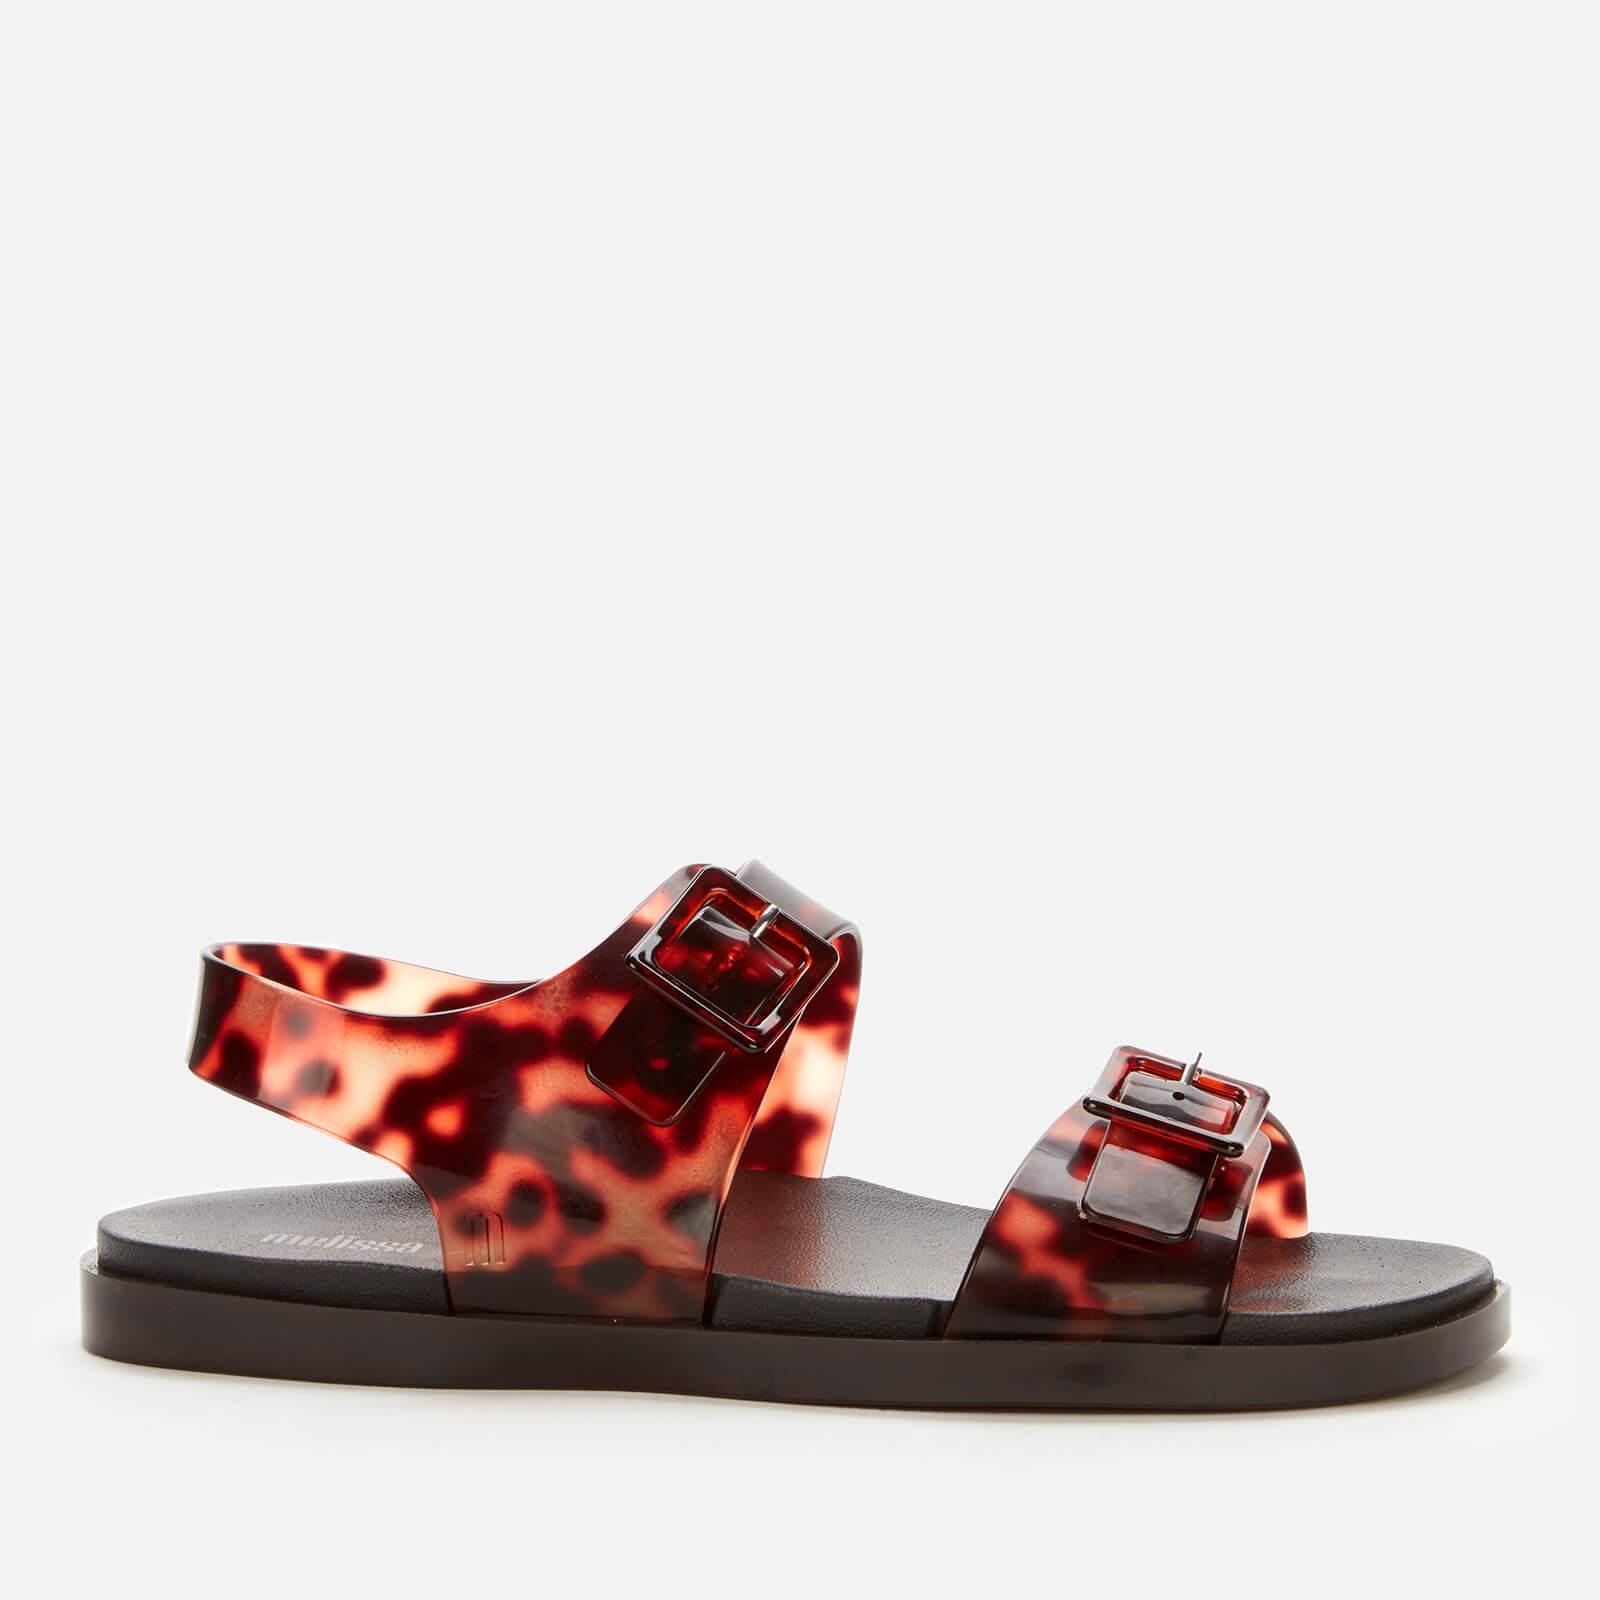 Melissa Women's Wide Double Strap Sandals - Tortoiseshell - UK 7